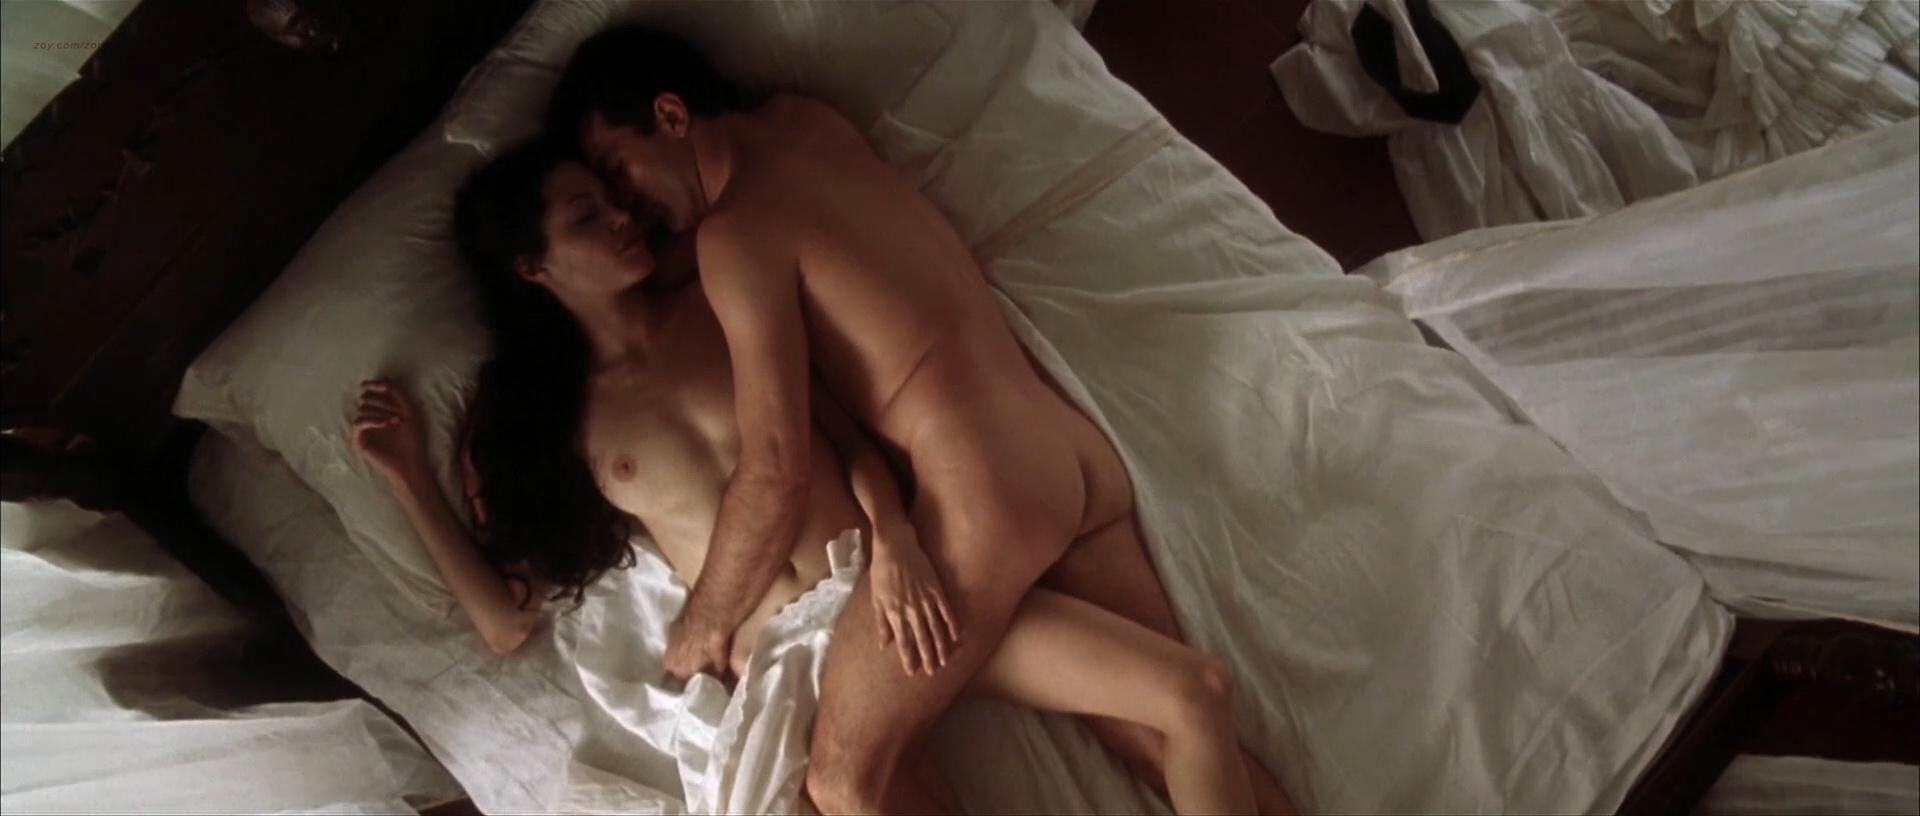 Angelina Jolie Nude And Hot Sex In - Original Sin 2001 -9368